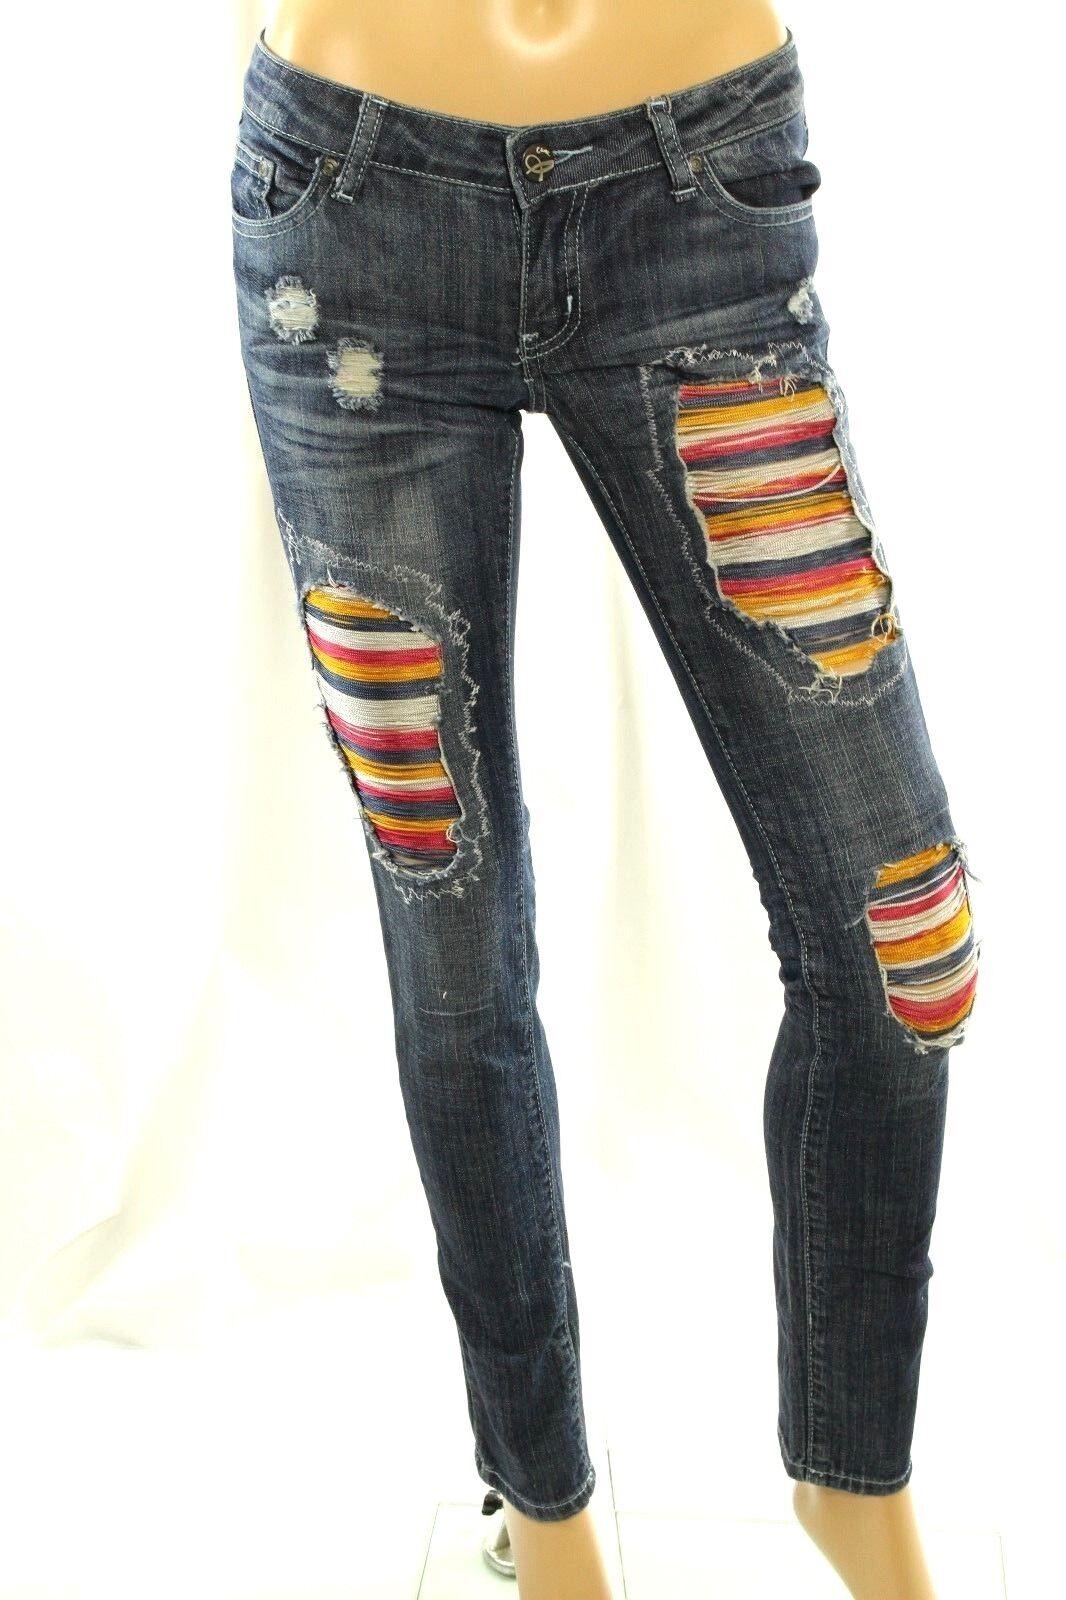 Claudio Milano Damen Jeans Blau Distressed Skinny Stretch Gr. 1 (26)